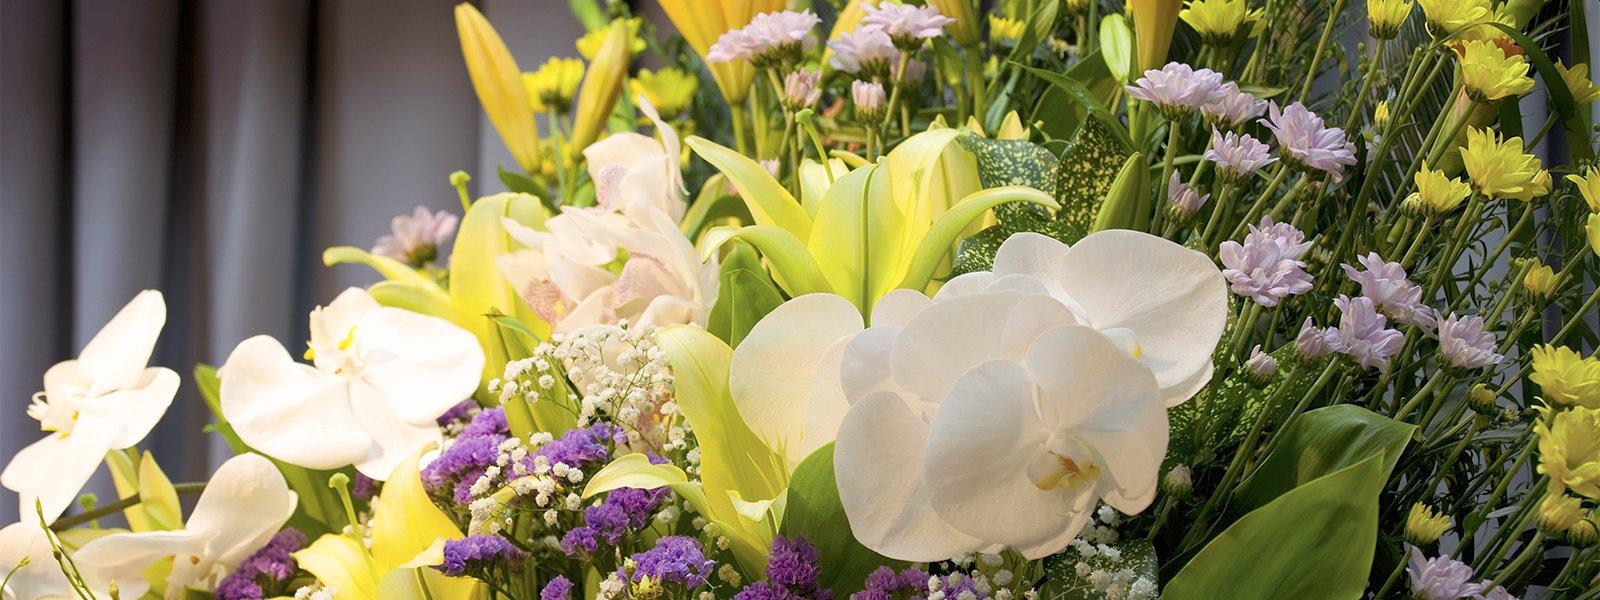 Funeral Flowers Florist Kennett Square Sympathy Flowers Casket Sprays